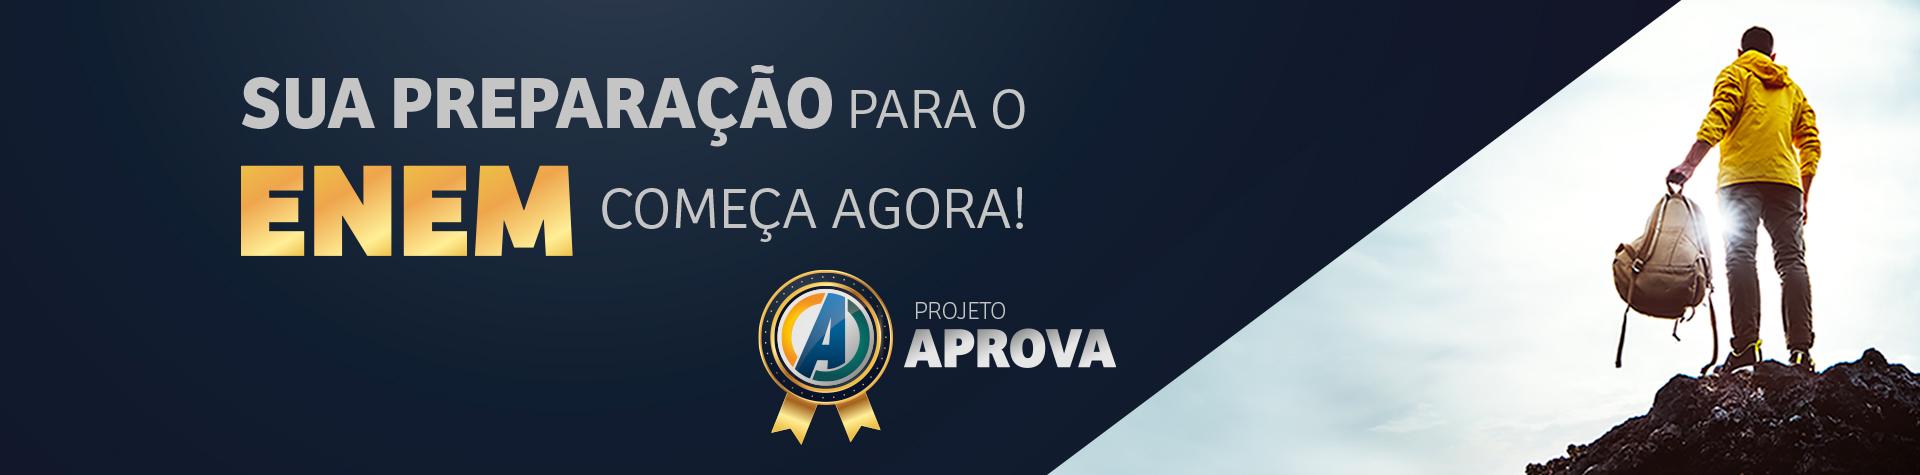 slide_projeto_aprova